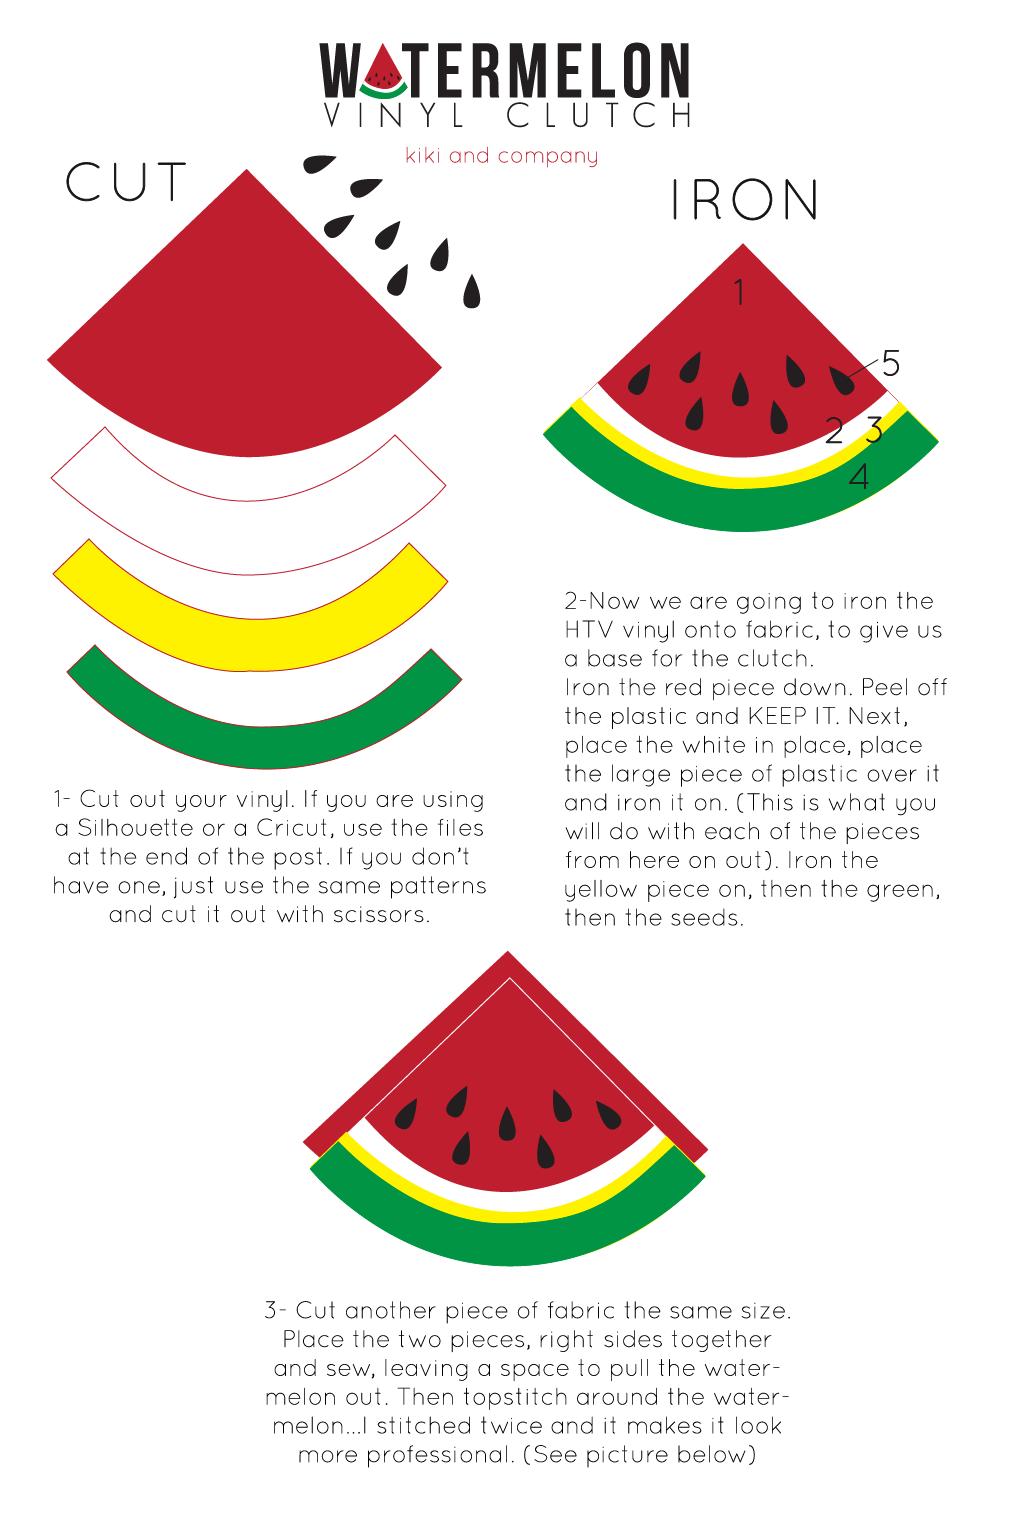 Watermelon Vinyl Clutch instructions